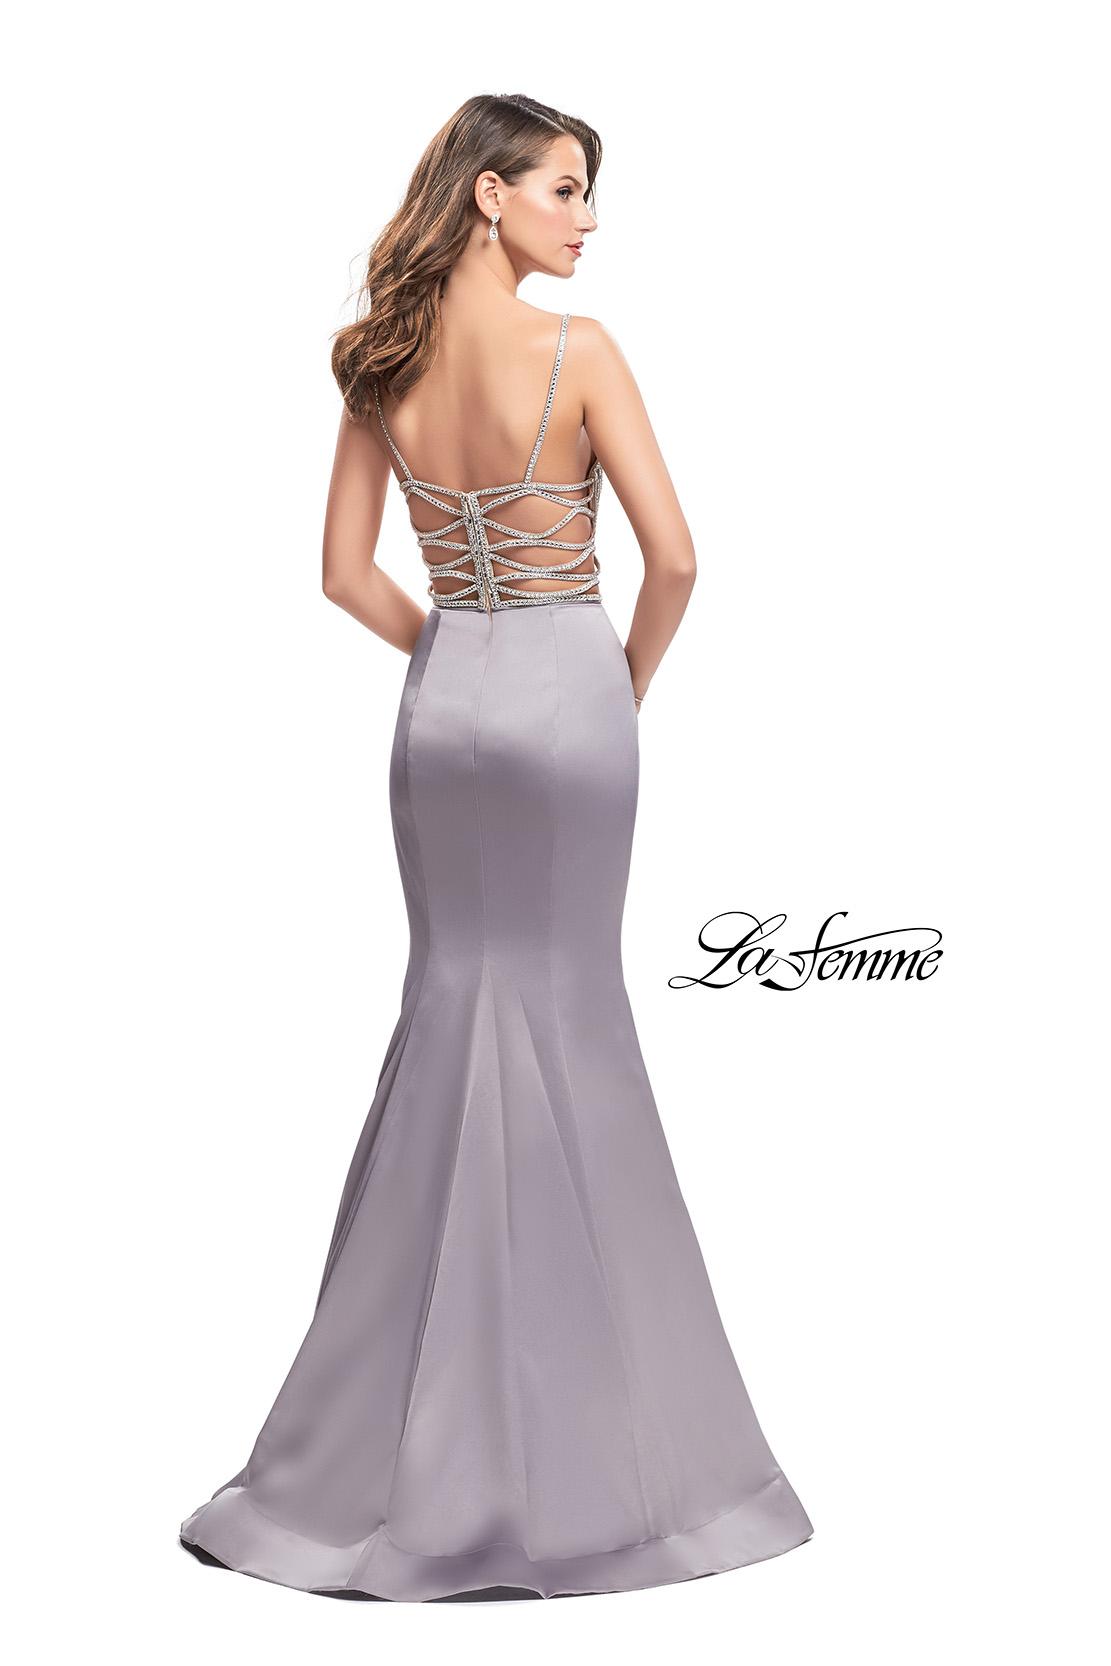 La Femme Prom Dresses Style 24691 La Femme